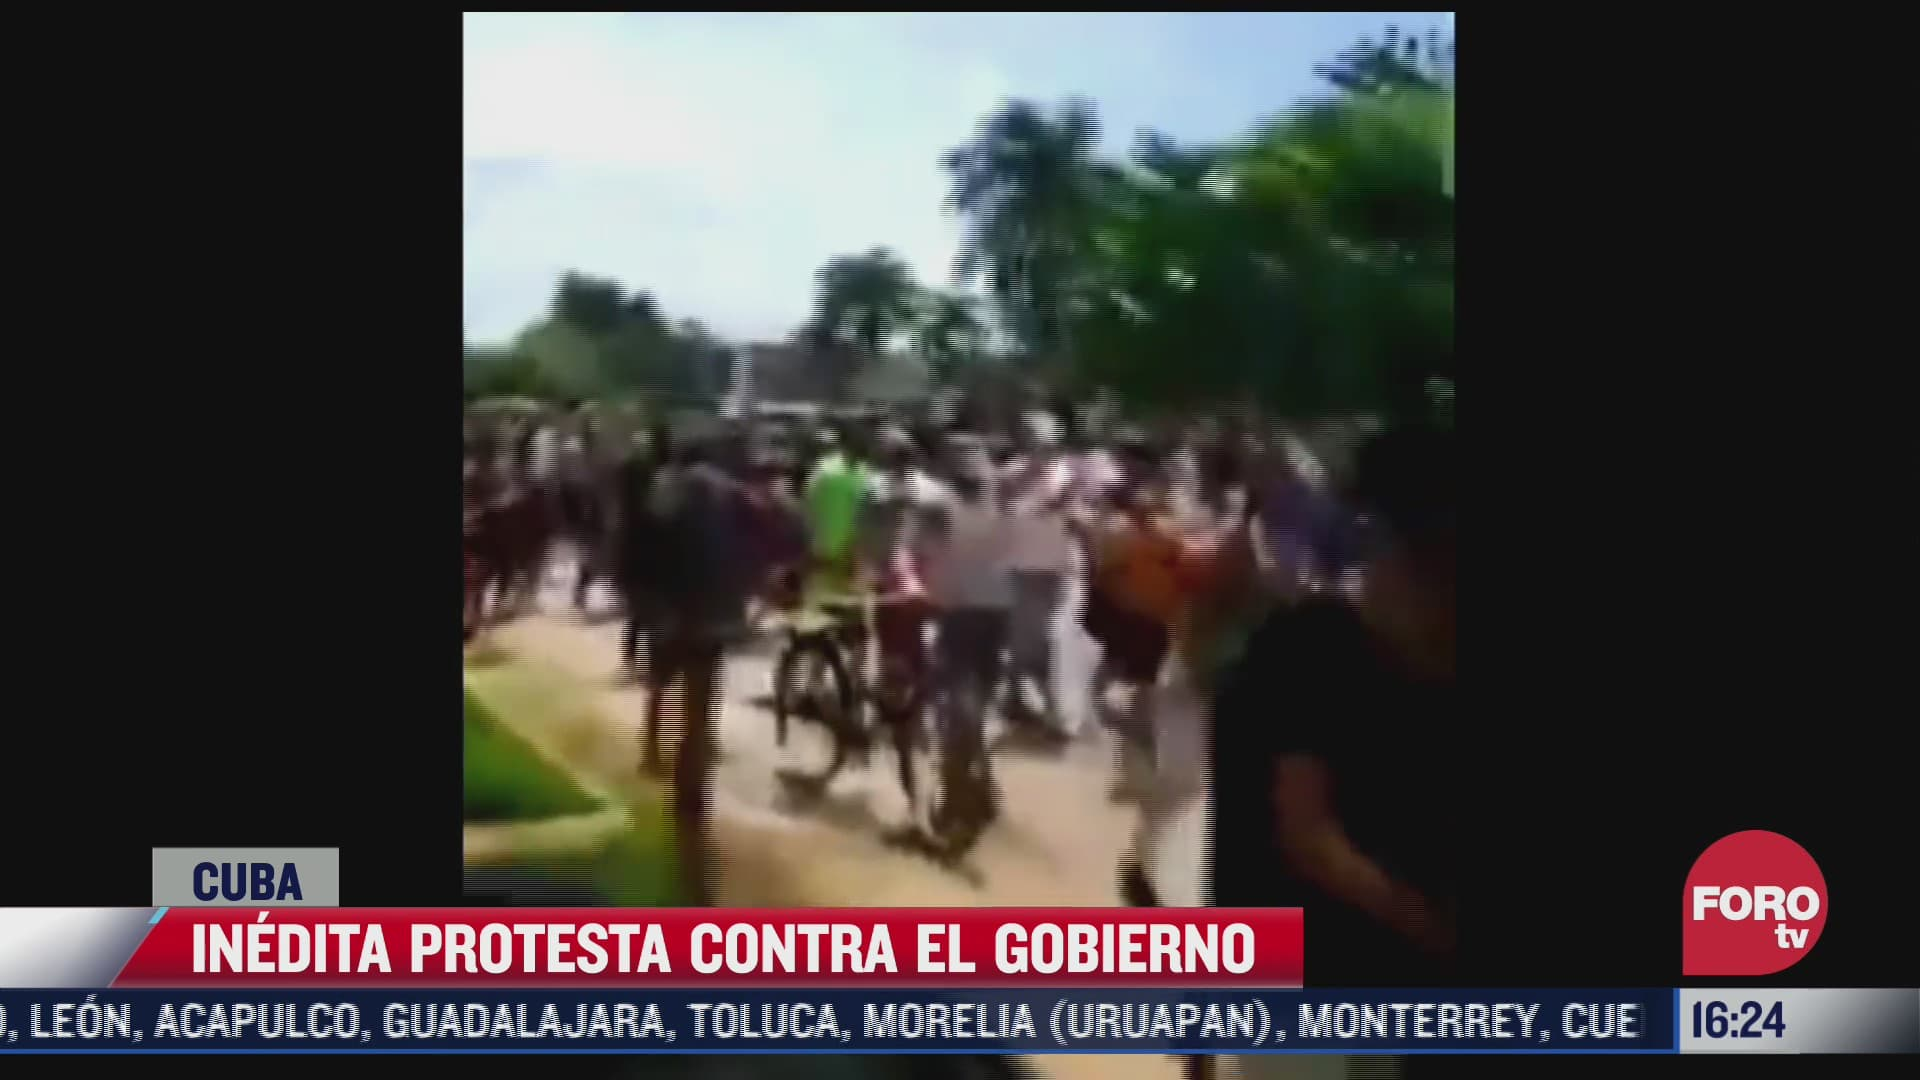 multitudinaria e inedita protesta antigubernamental en cuba